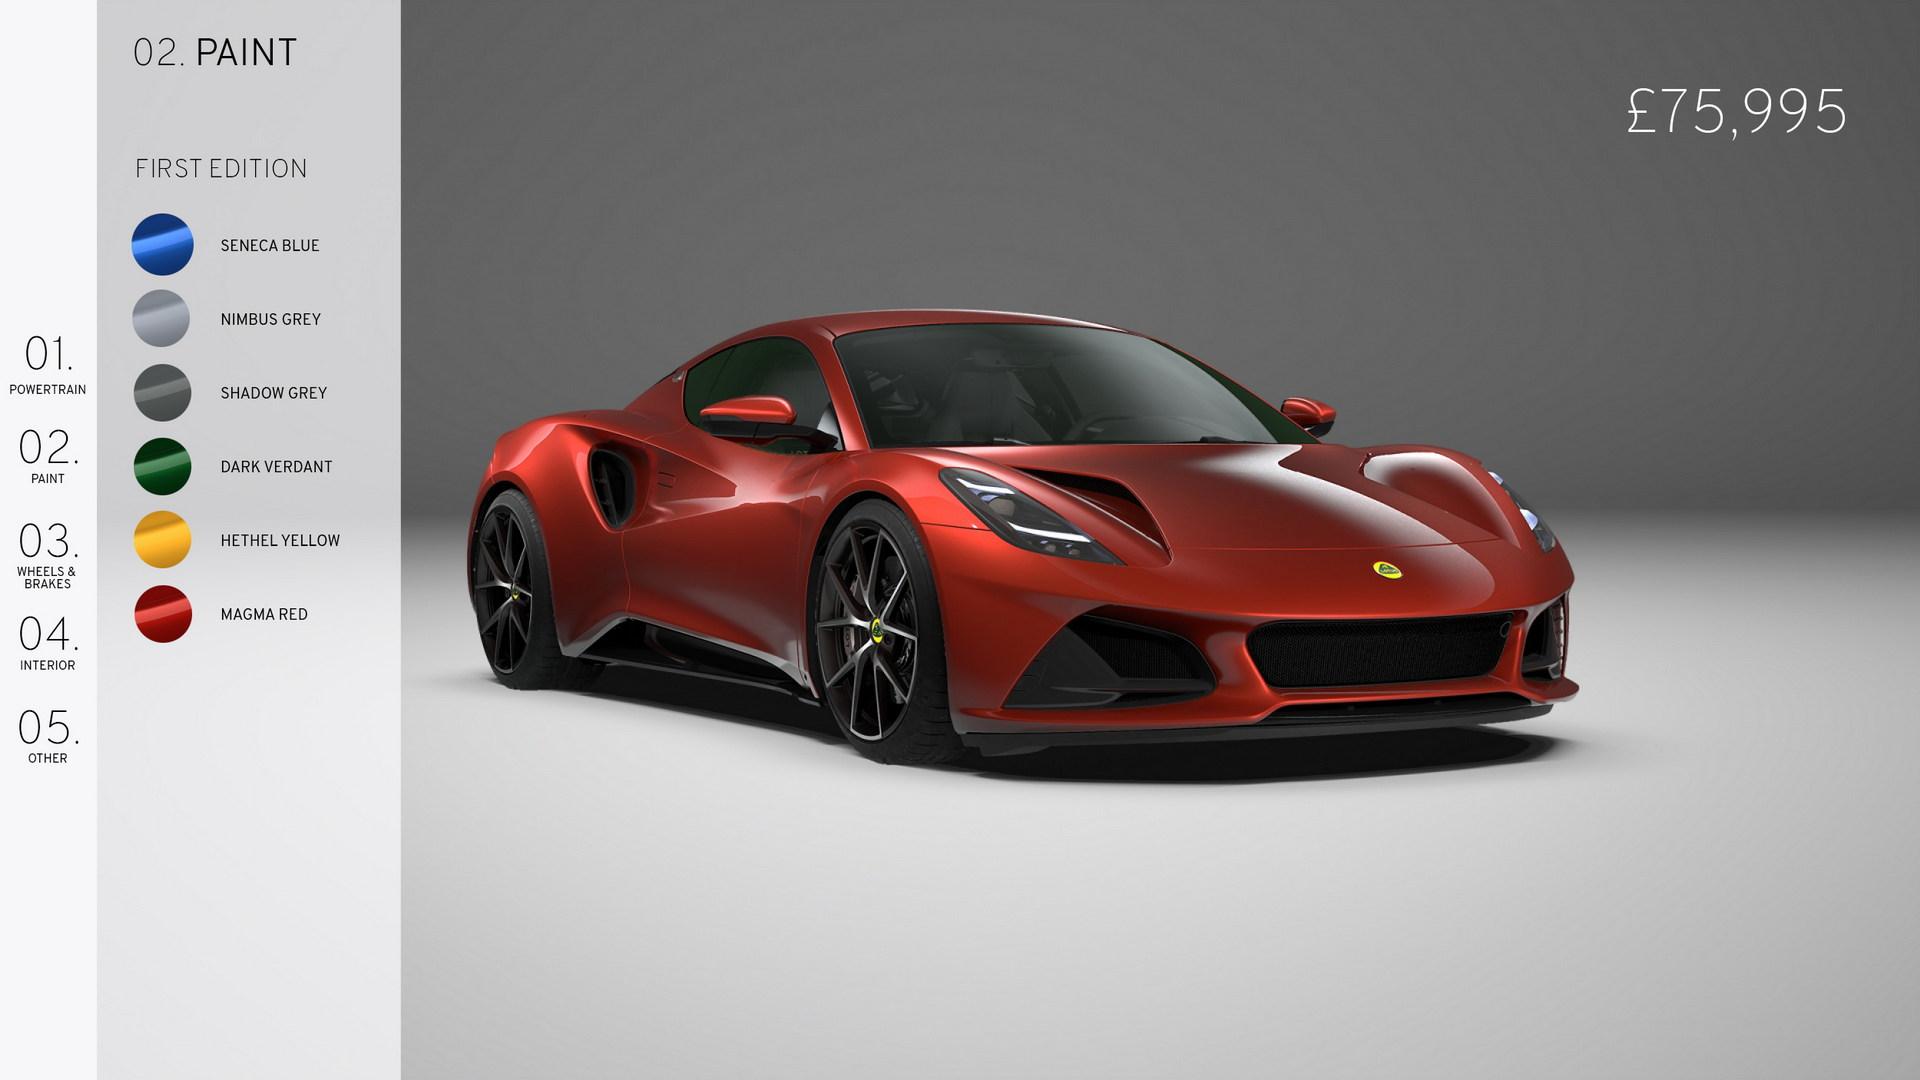 Lotus Emira First Edition